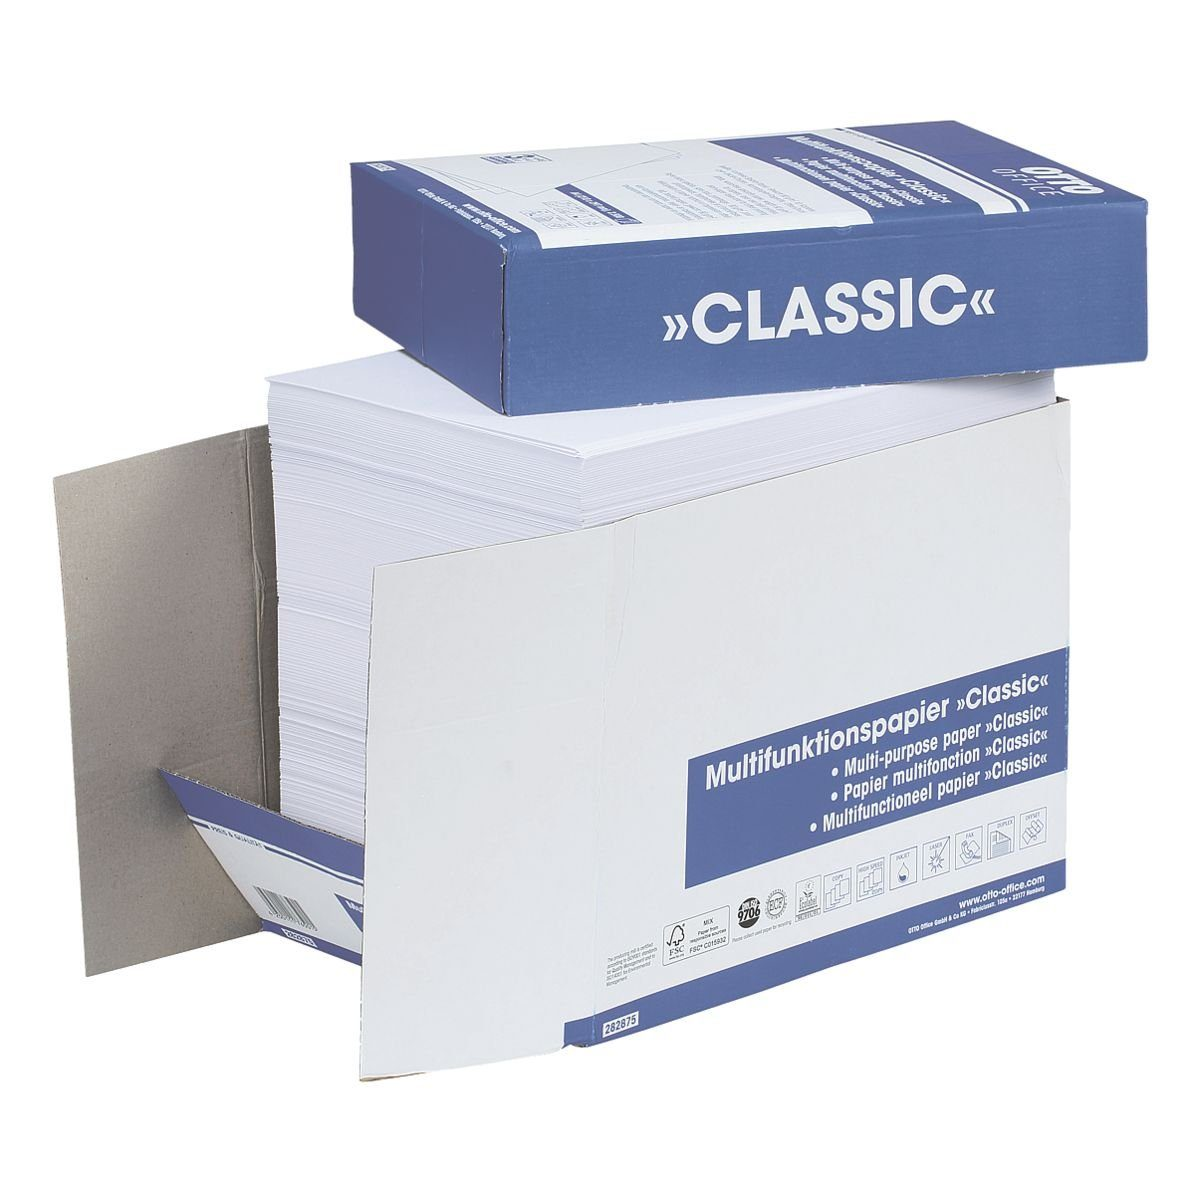 OTTOOFFICE STANDARD Öko-Box Multifunktionales Druckerpapier »Classic«